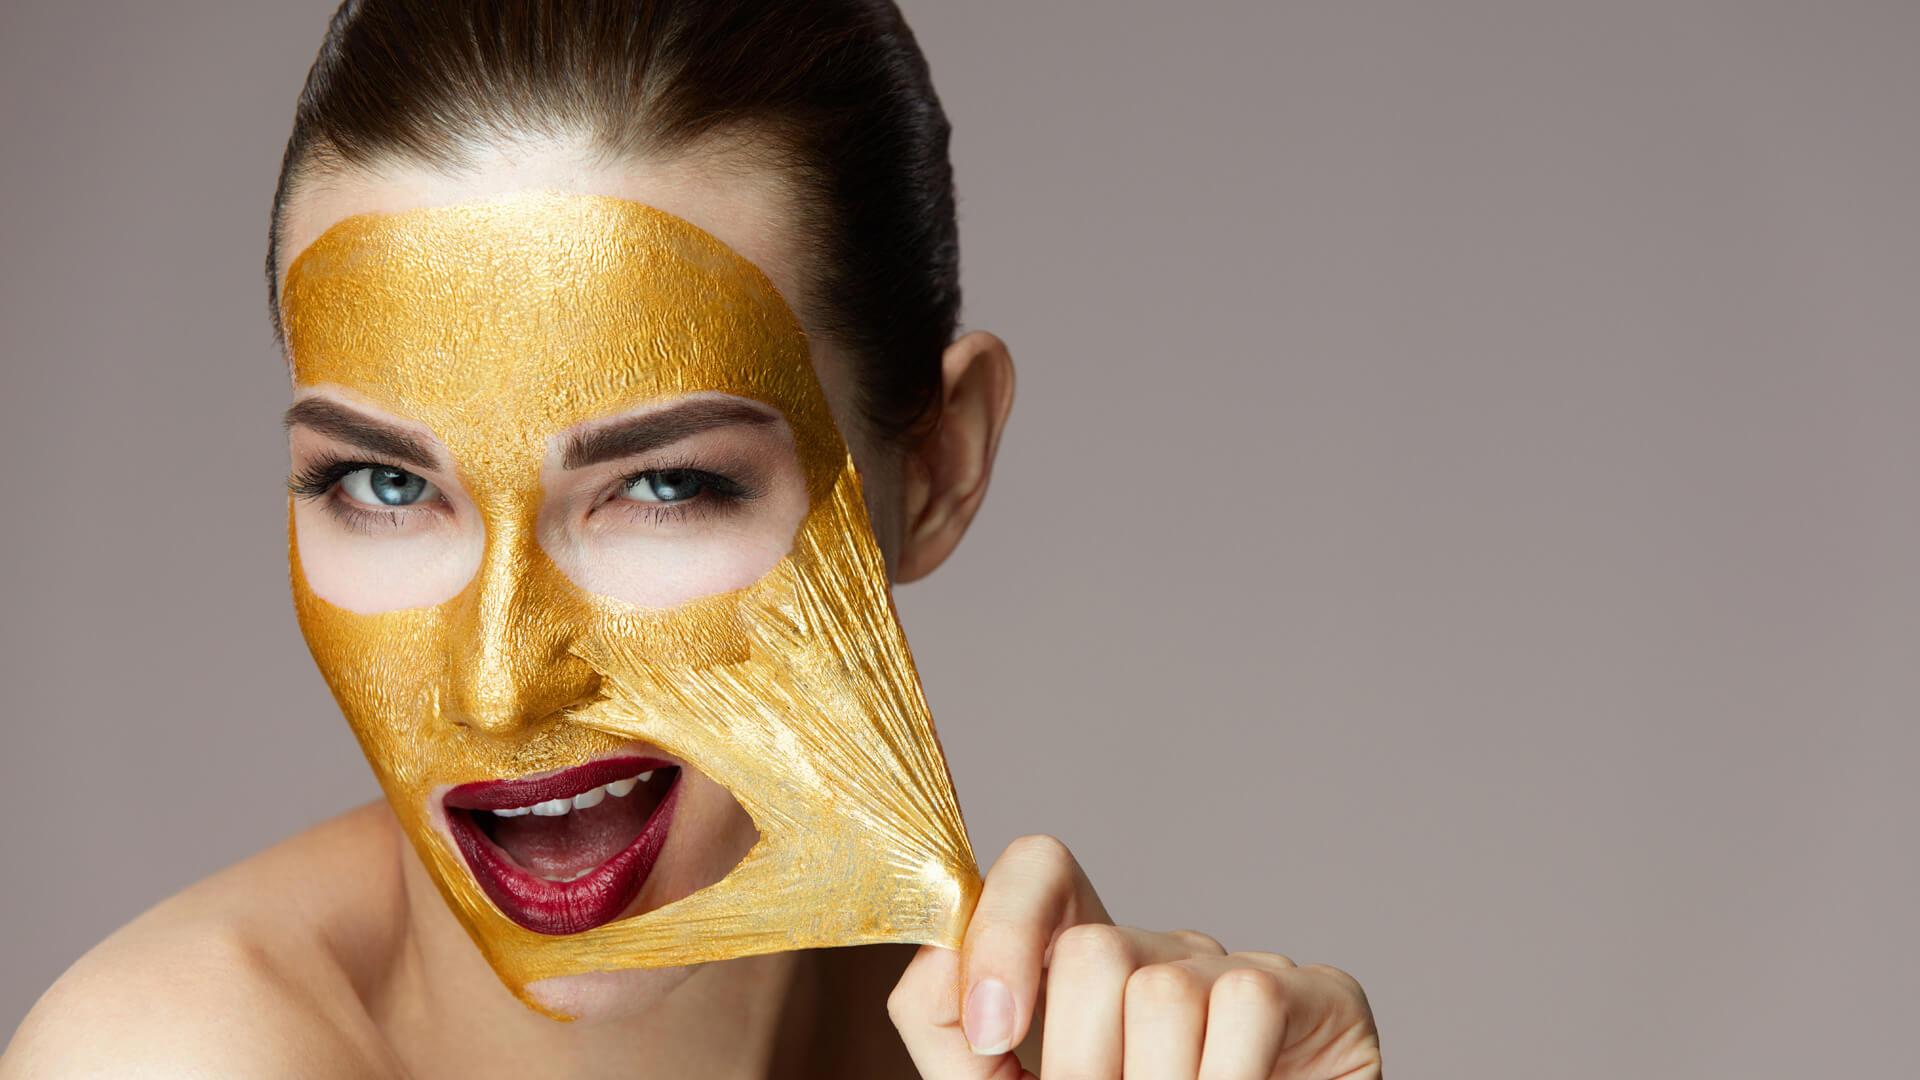 Frau mit Pflegemaske, bronze. Copyright: puhhha (fotolia #164342283)